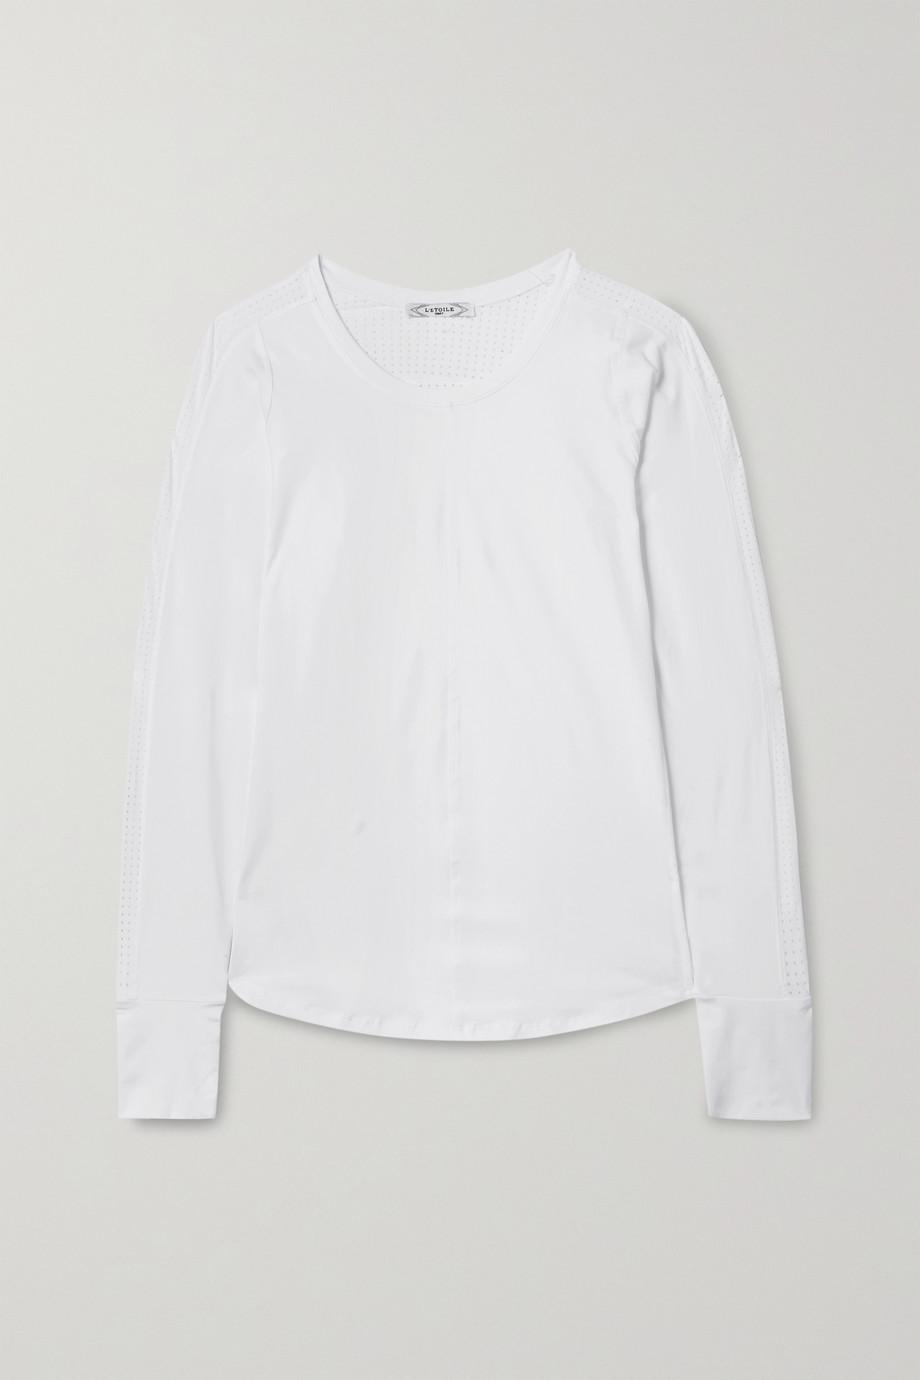 L'Etoile Sport Mesh-paneled stretch-jersey top